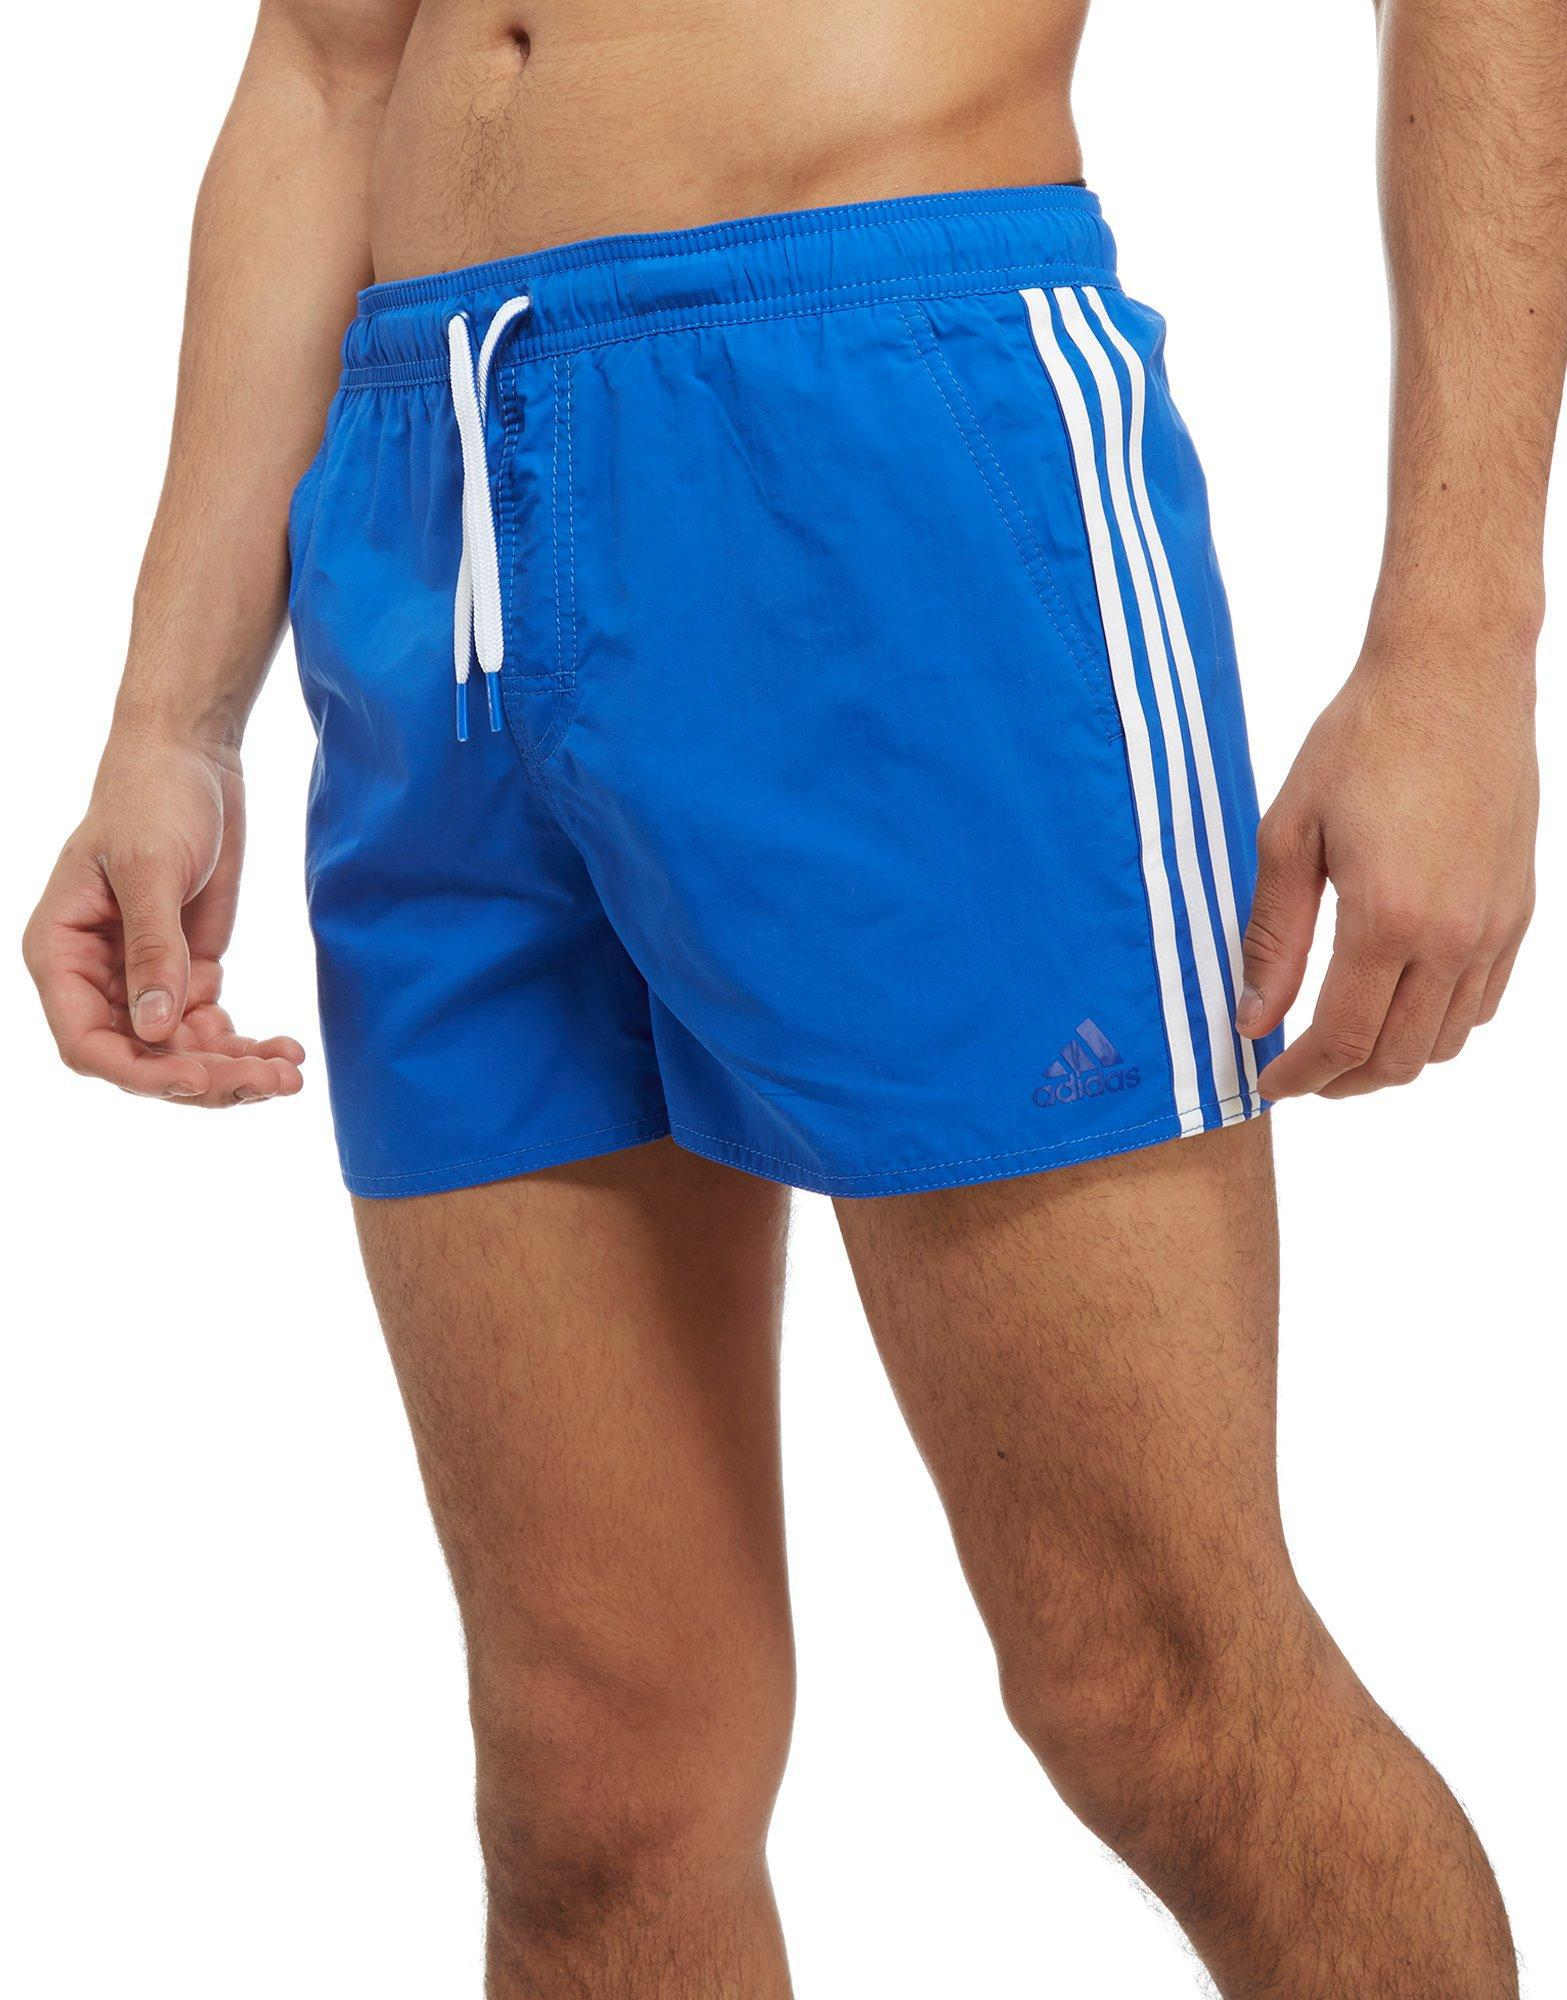 d557723b2b adidas 3-stripes Swim Shorts in Blue for Men - Lyst